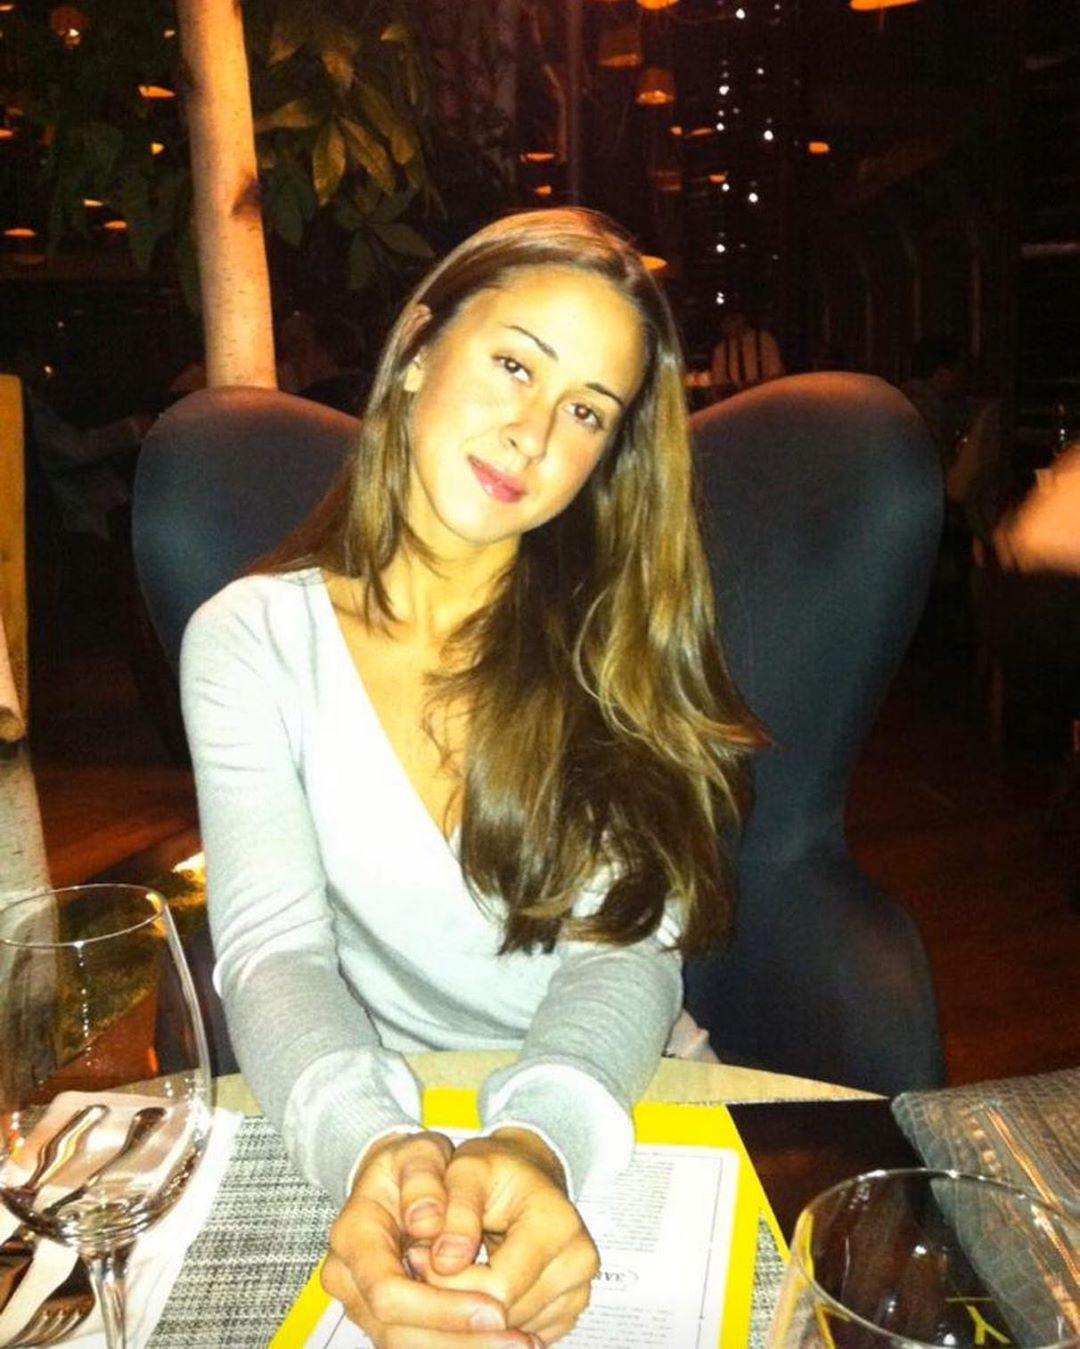 Татьяна Плаксина недавно отметила 30-летие